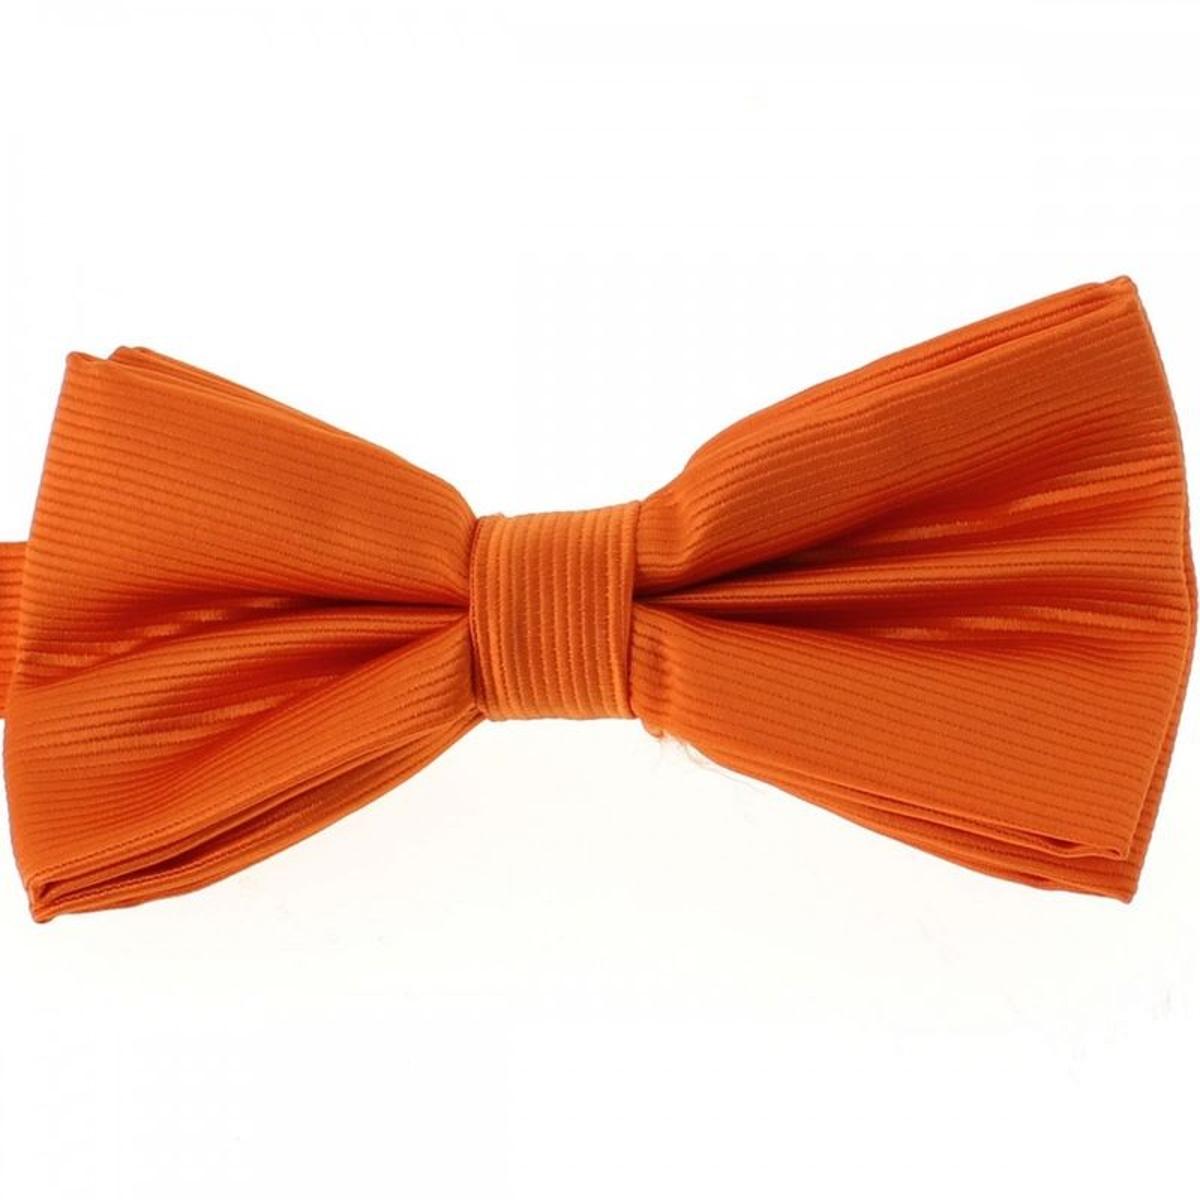 Noeud Papillon CLJ, Naveline, Orange vif